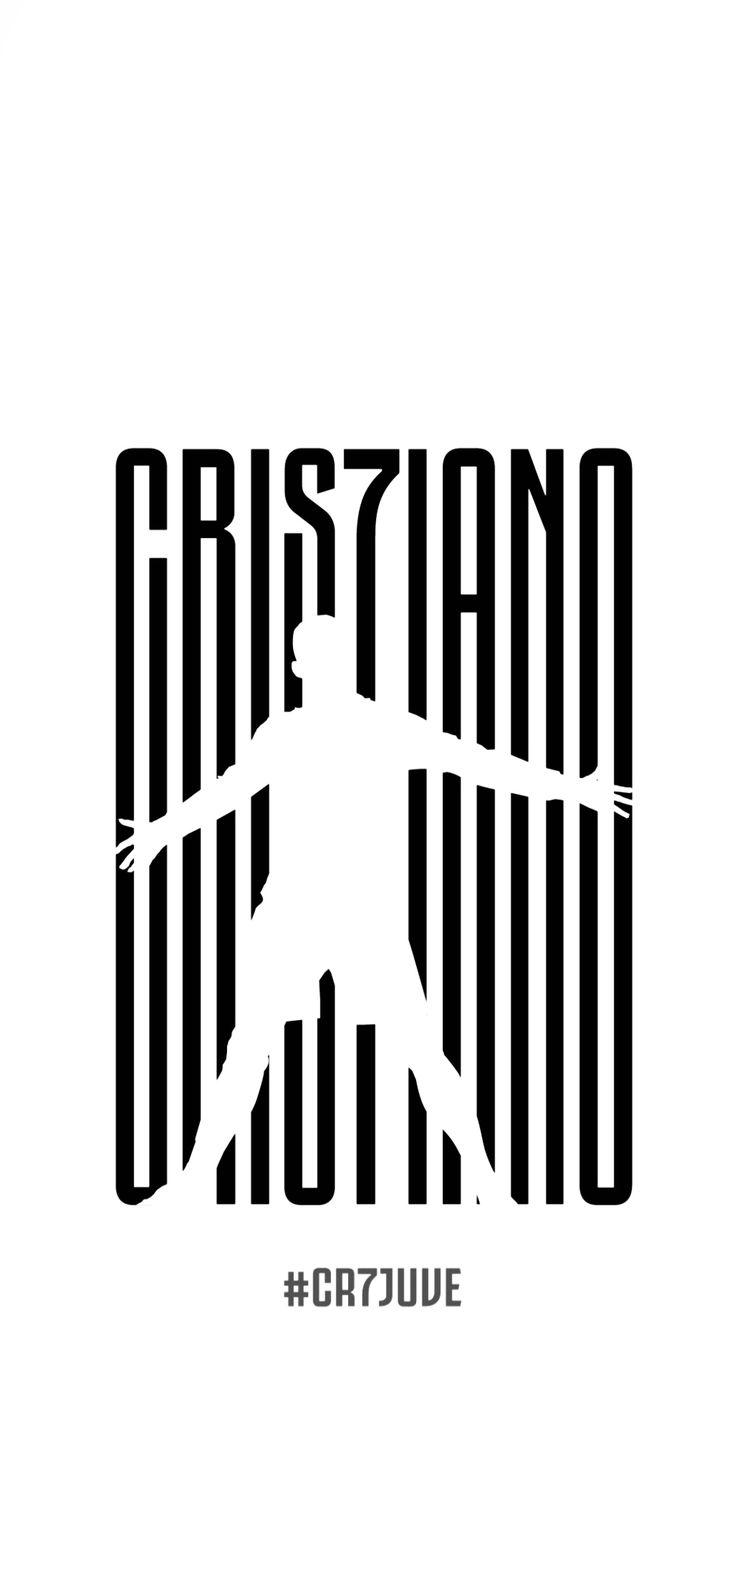 Cristiano Ronaldo Iphone X Wallpaper Juventus Juve Ju Gdrac